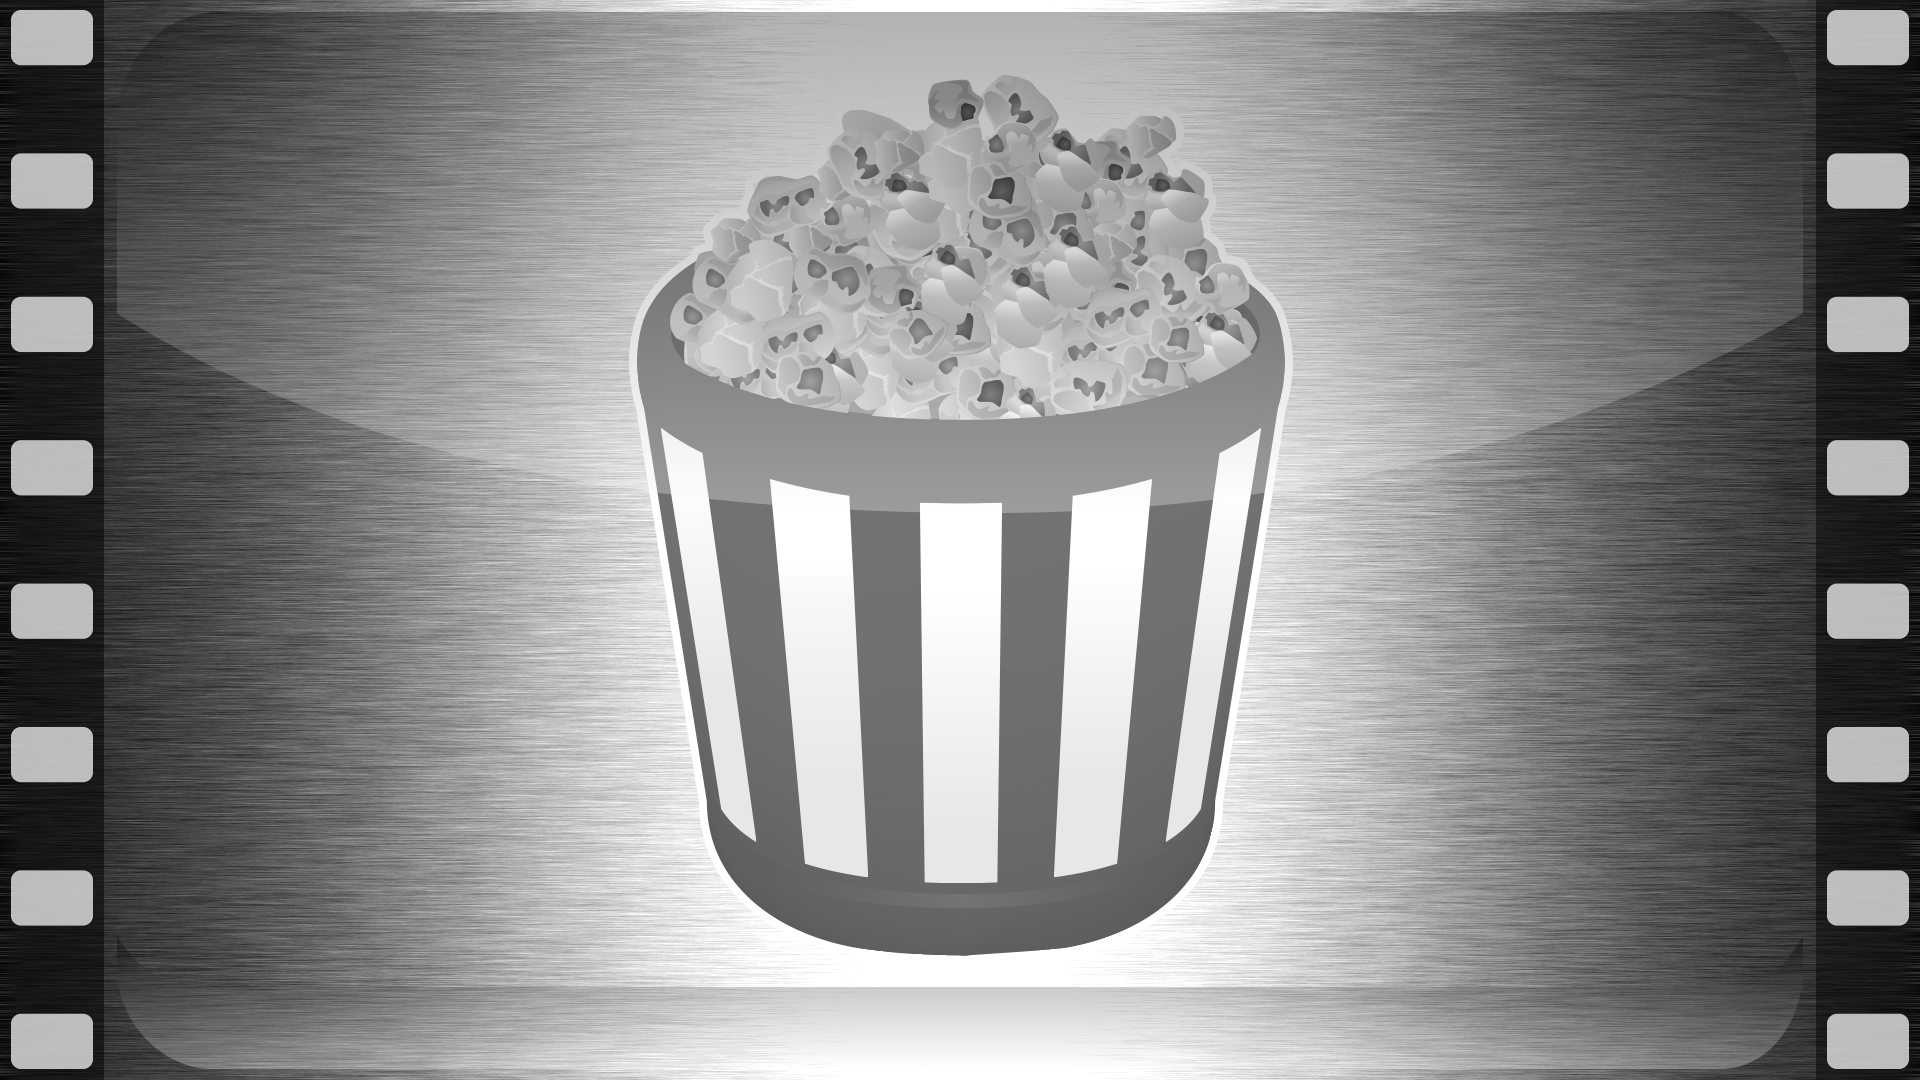 Need More Popcorn